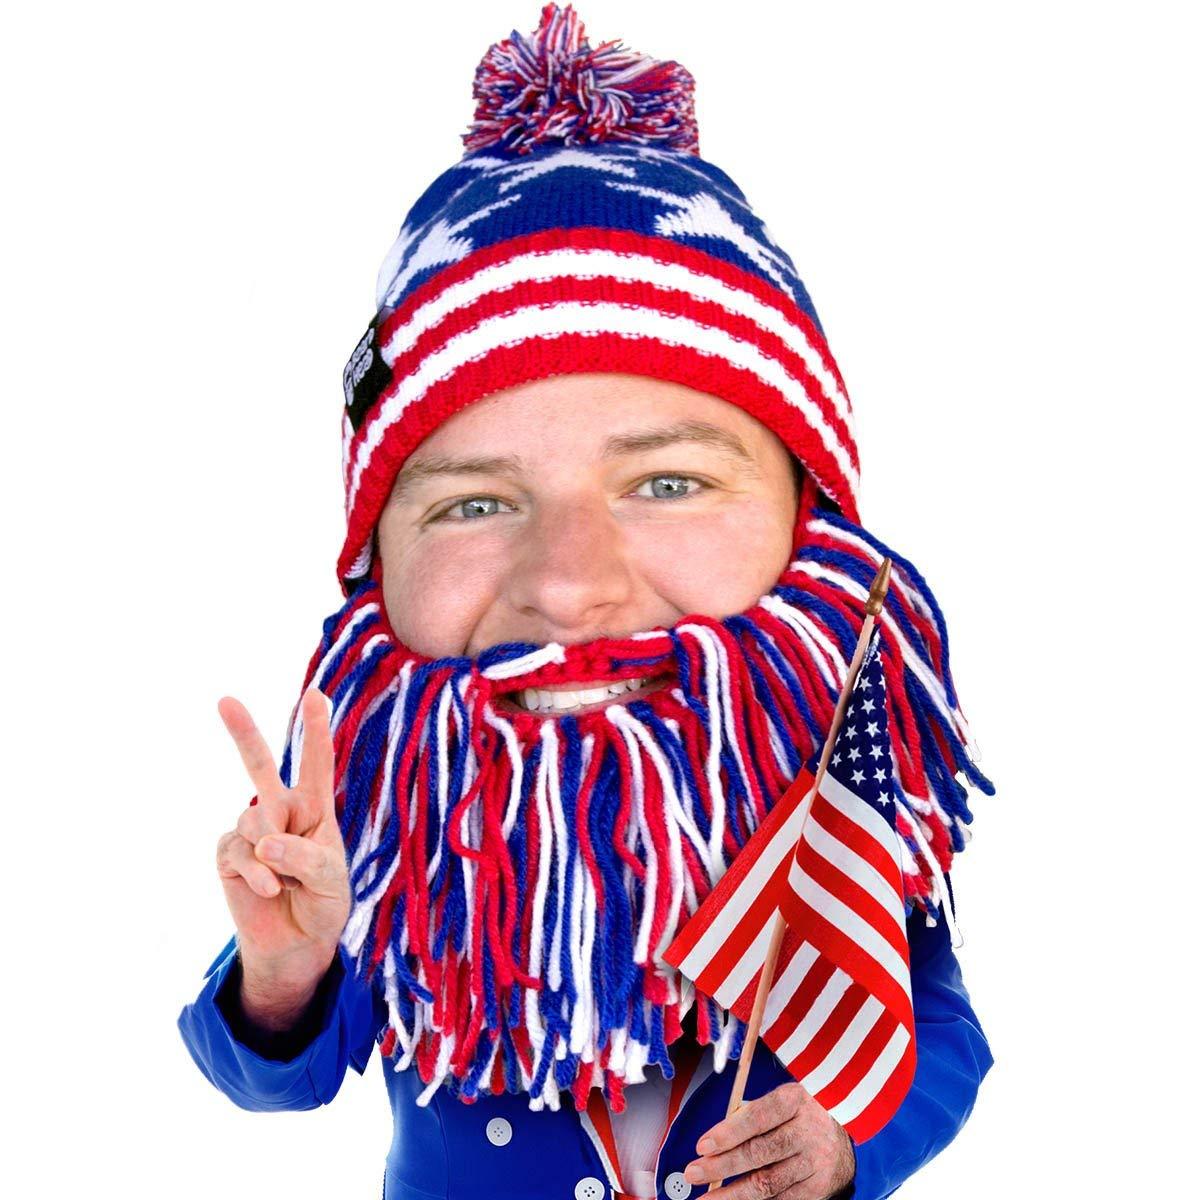 bdf4e5cc819 Get Quotations · Beard Head - The Original Patriot Knit Beard Hat